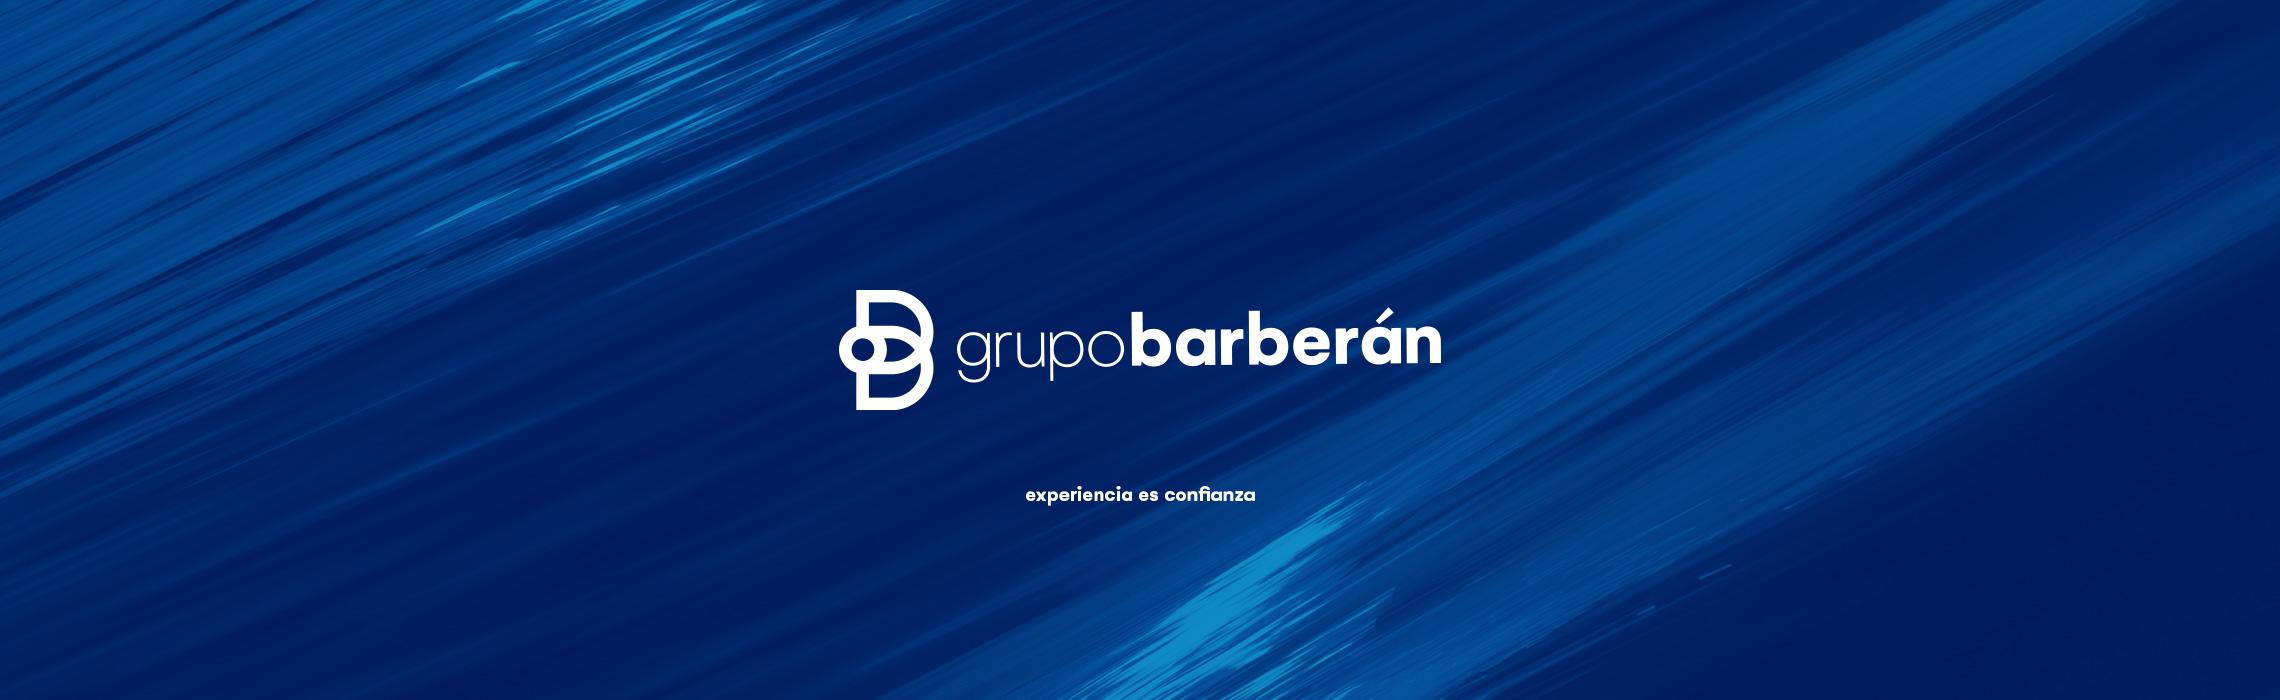 fondo-grupo-barberán